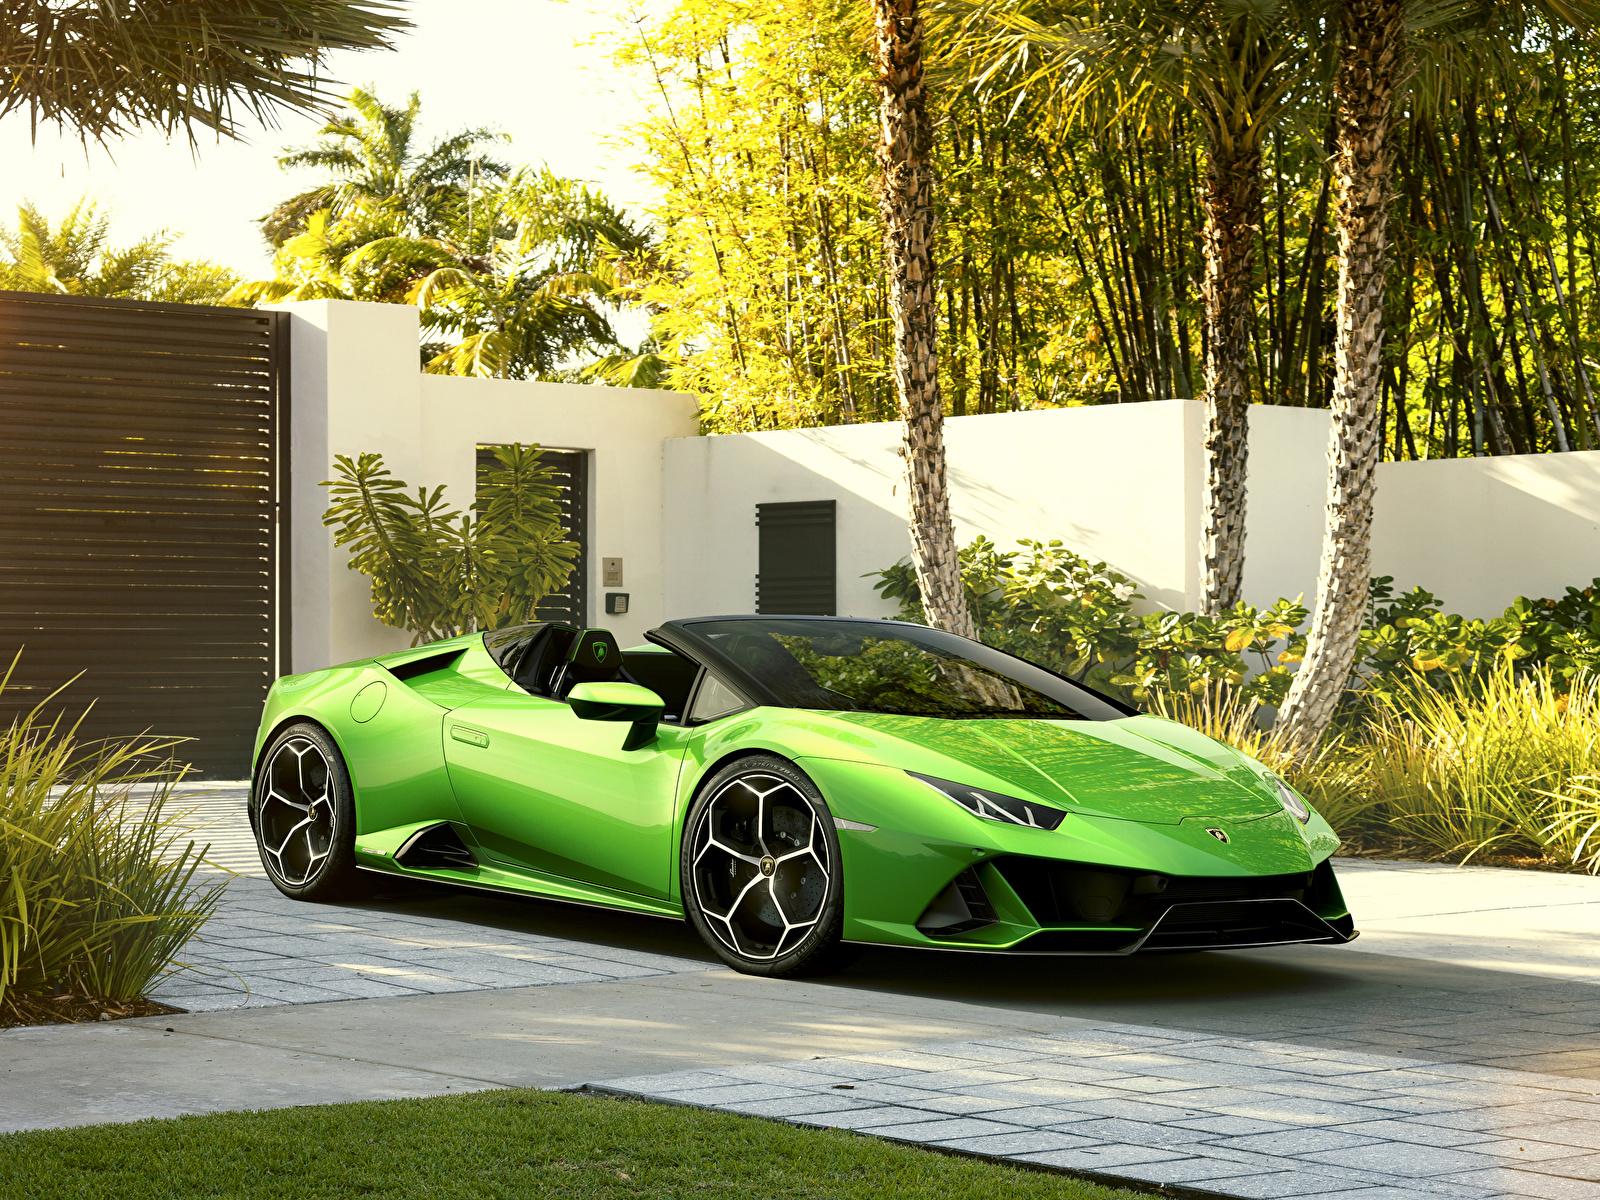 Hintergrundbilder Lamborghini 2019 Huracan EVO Spyder Roadster Gelb grüne auto Metallisch 1600x1200 hellgrüne Autos automobil